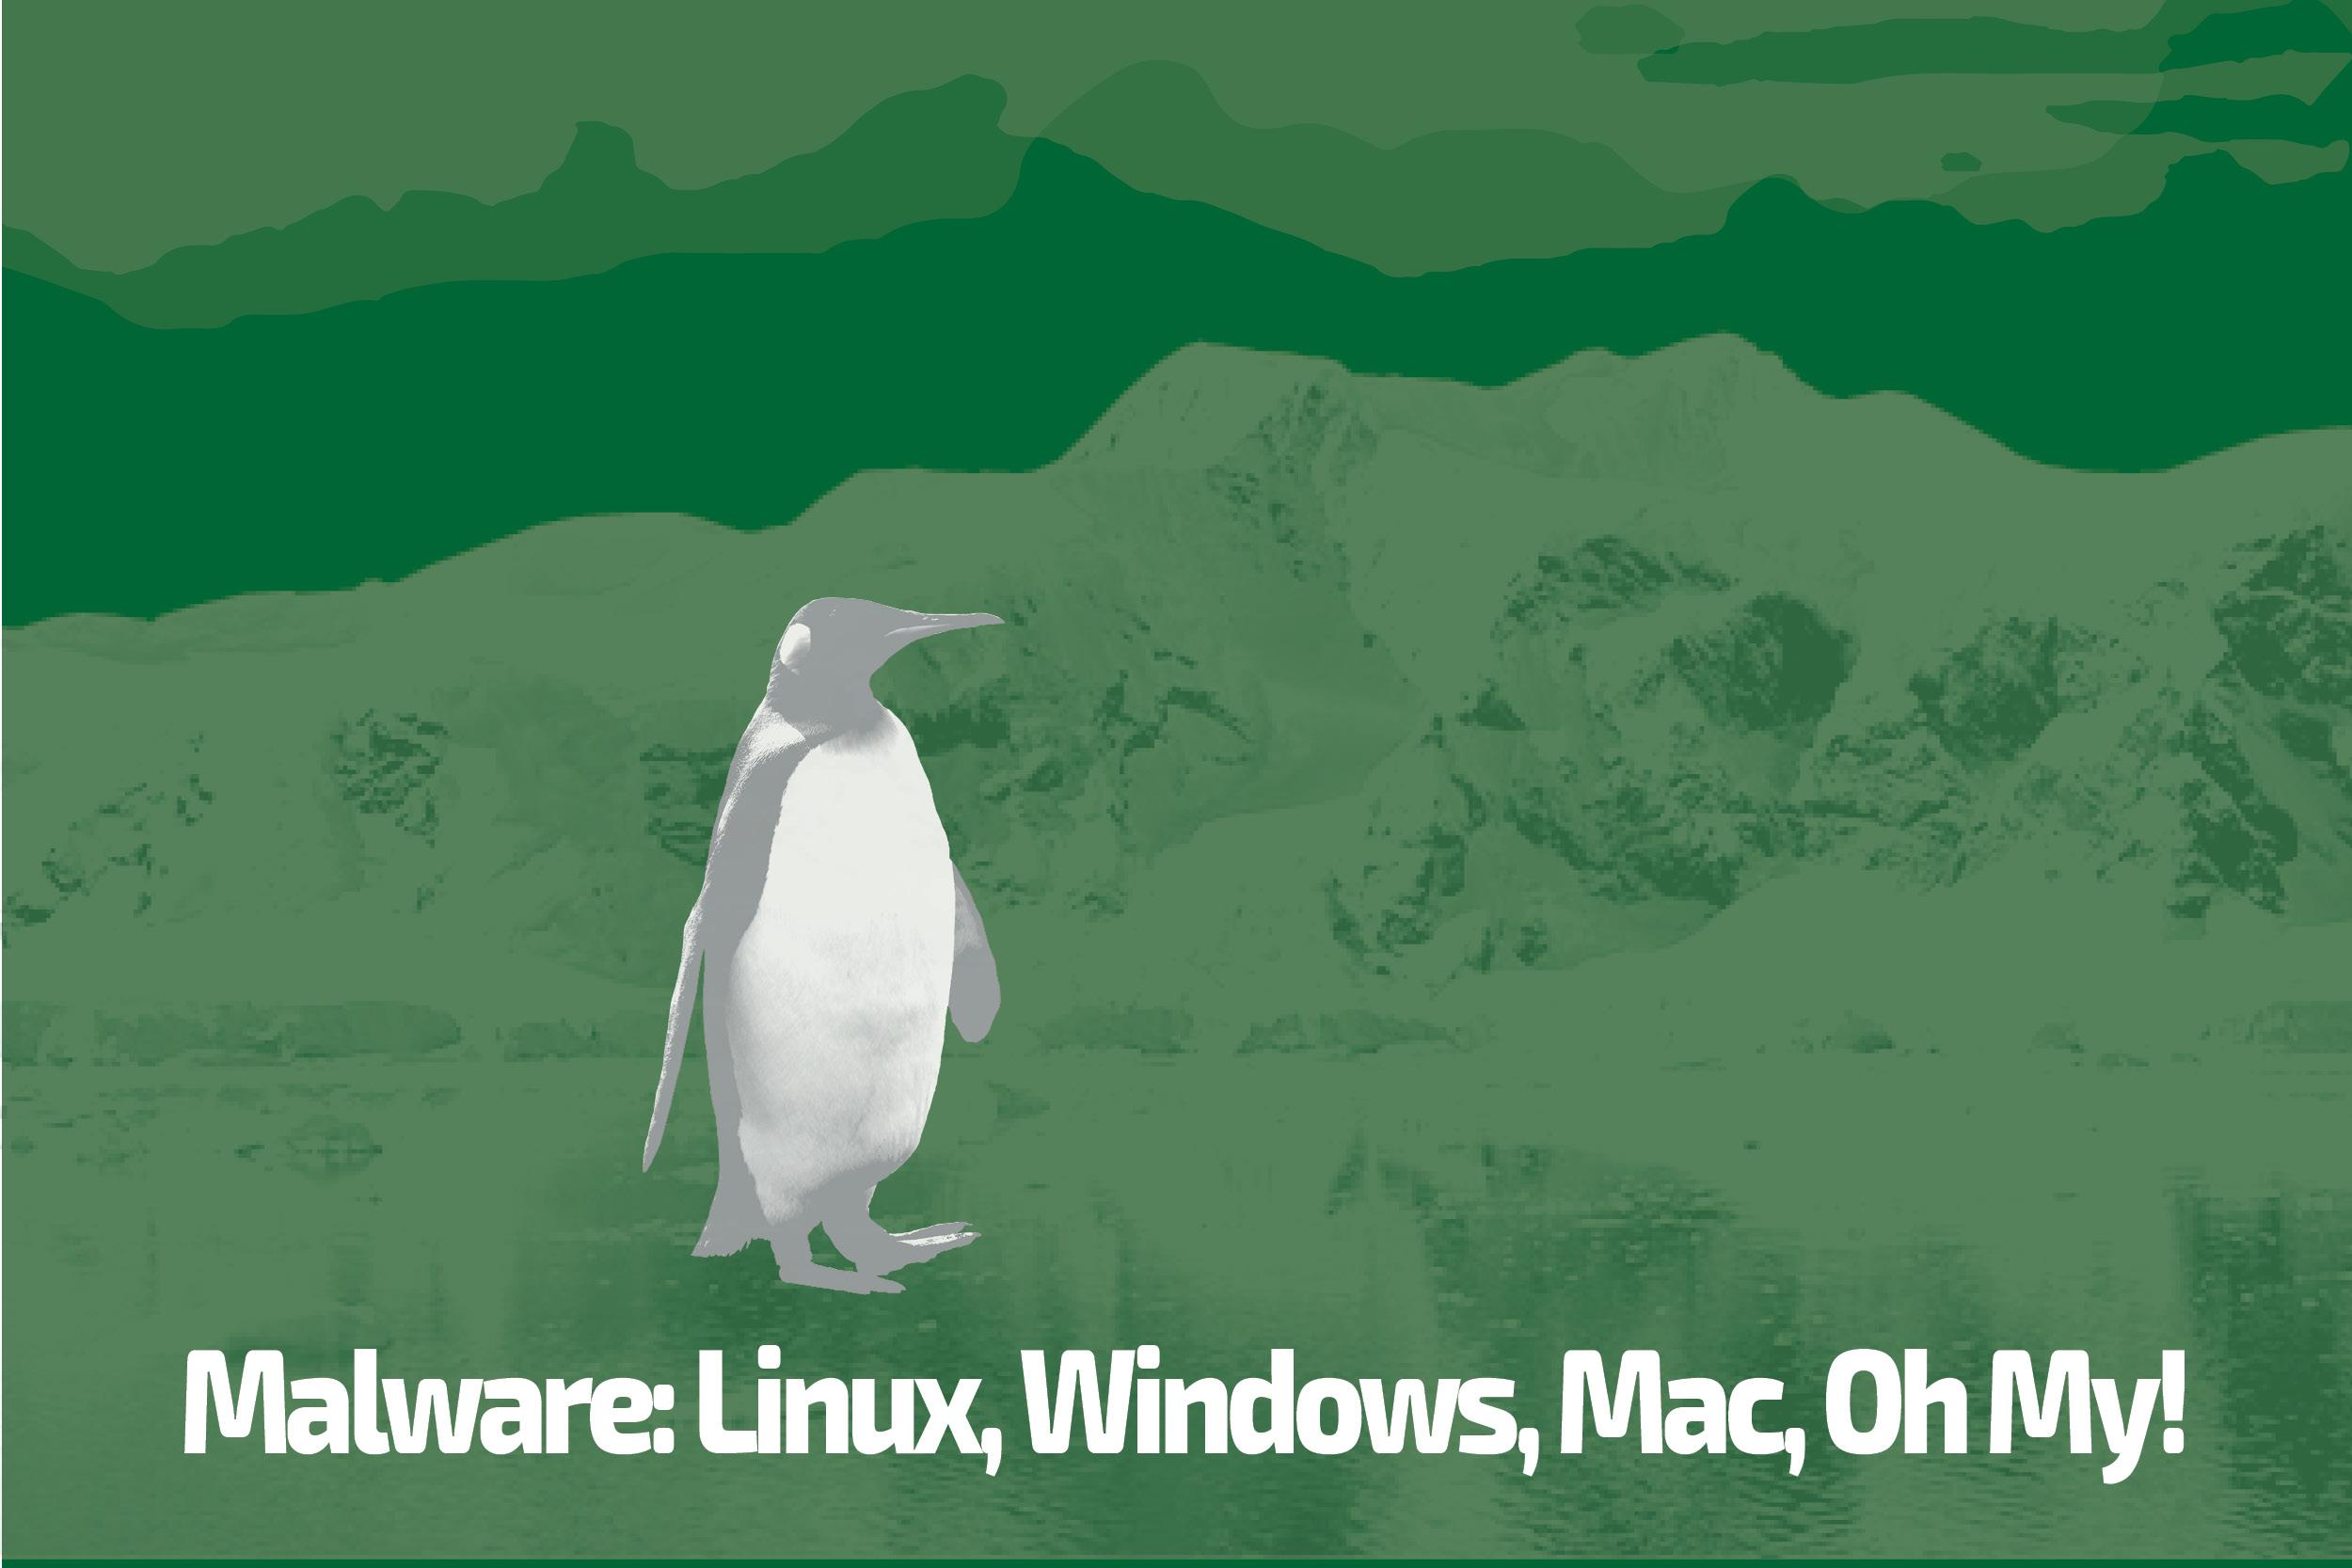 Malware: Linux, Mac, Windows, Oh My! - TrustedSec